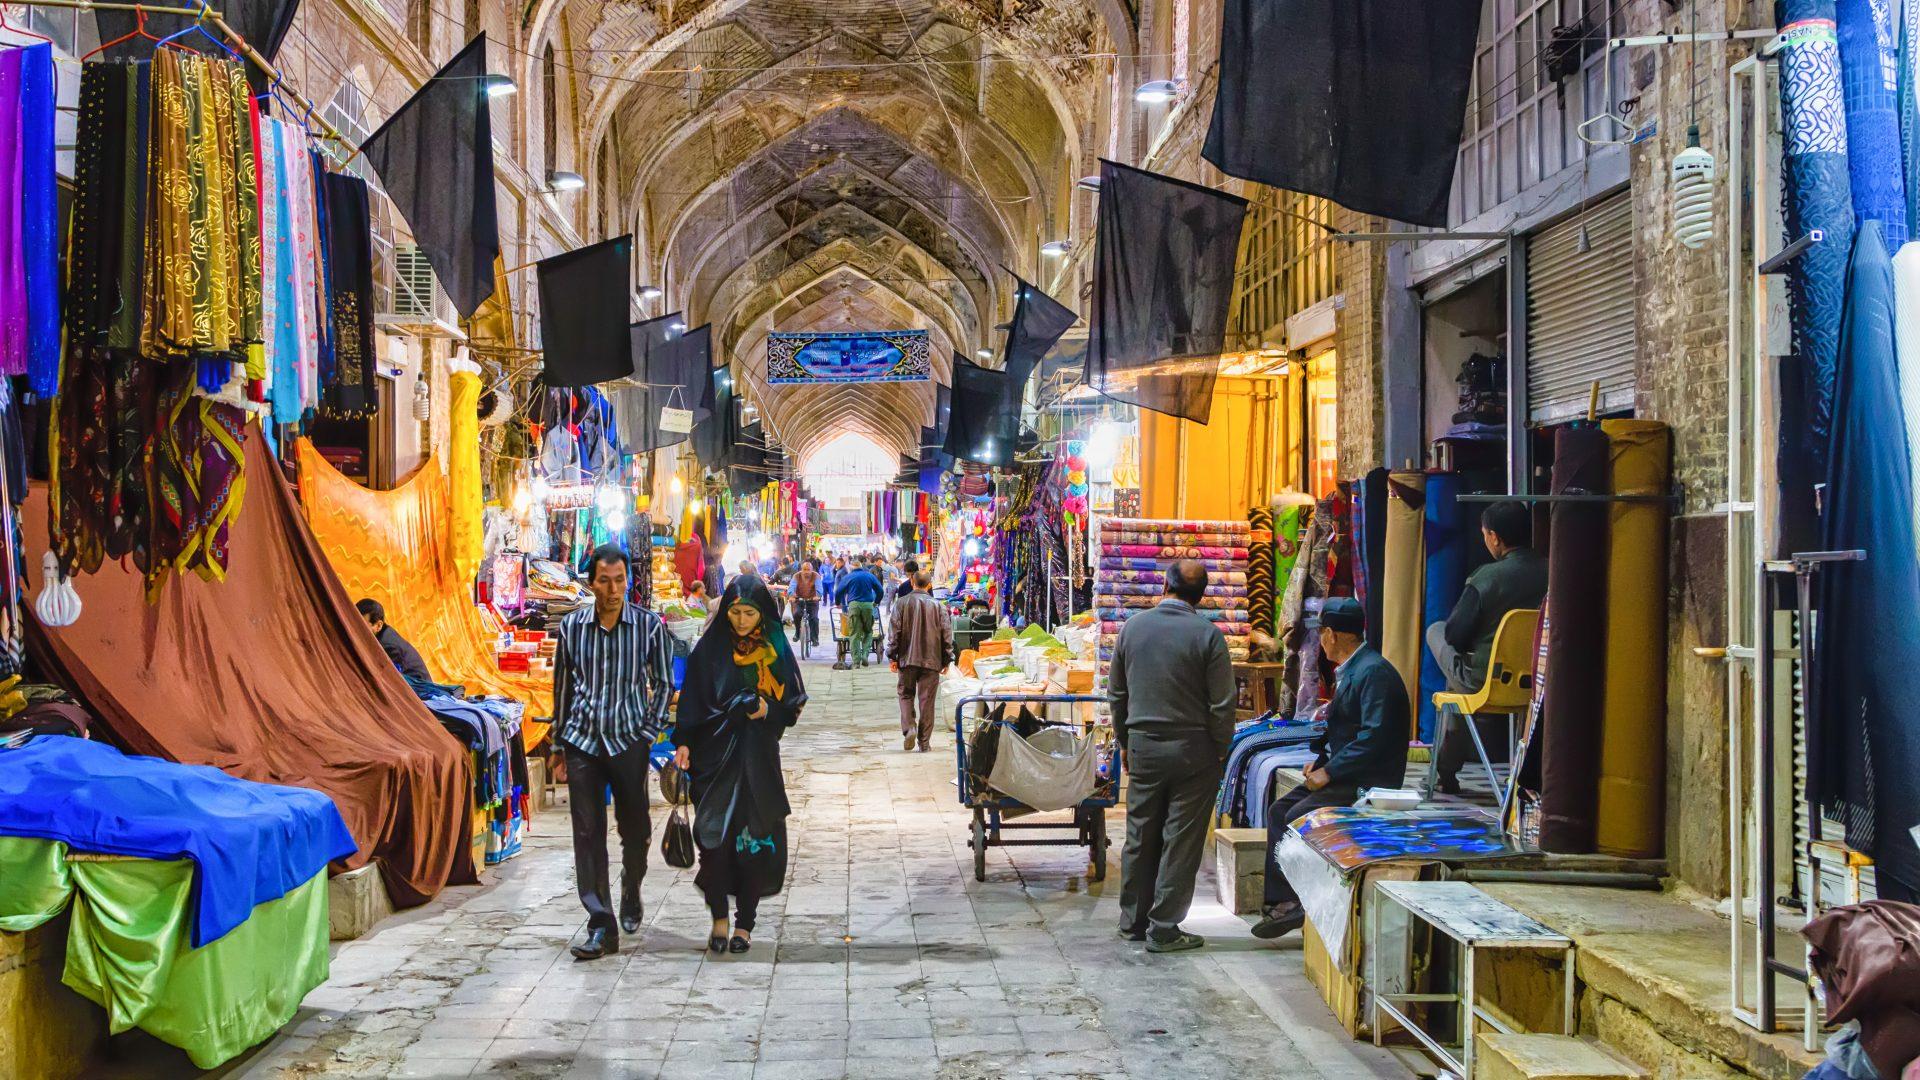 Traditional Iranian bazaar in Shiraz.